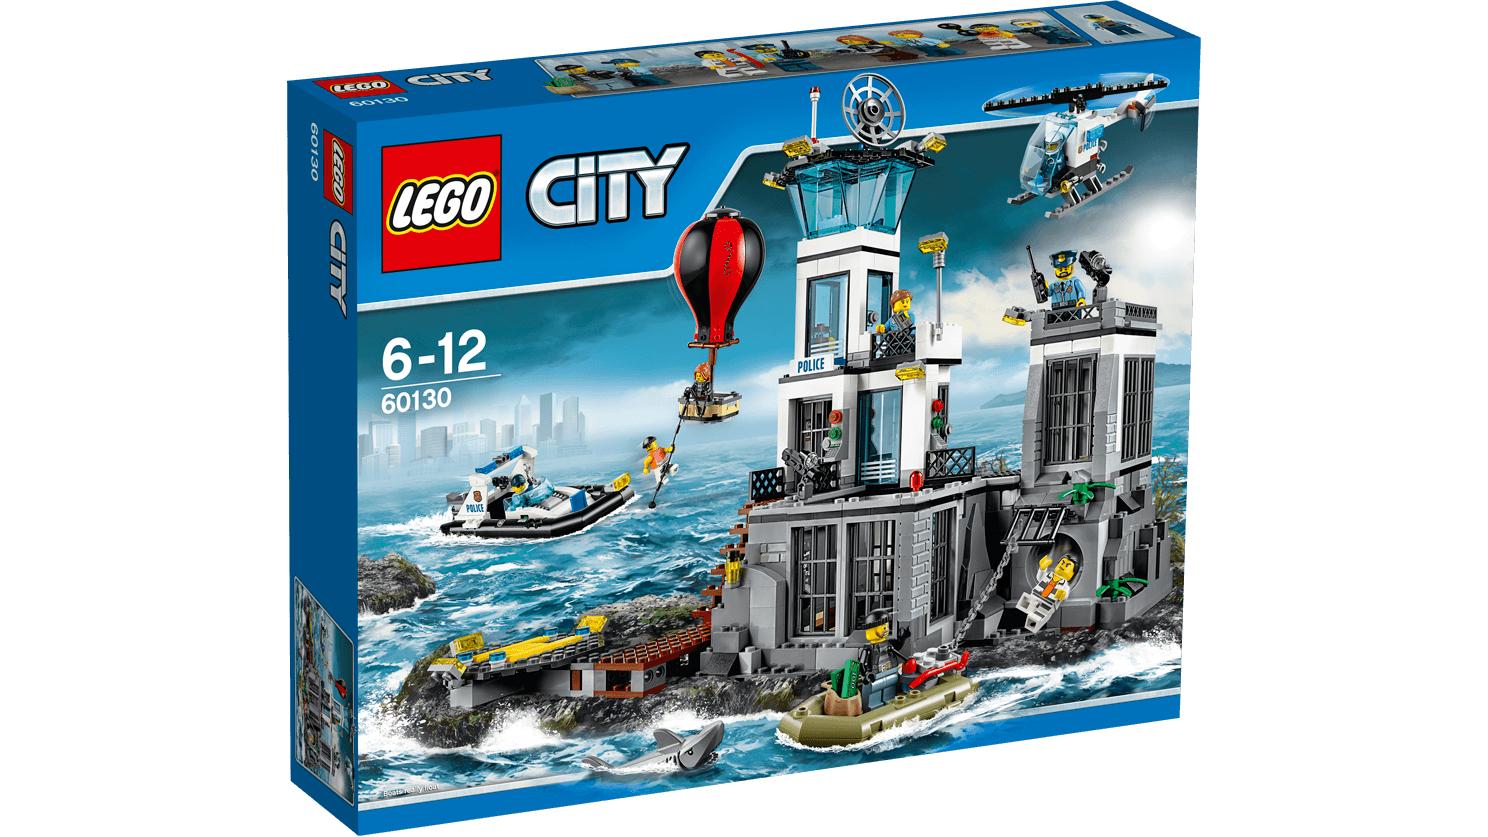 Lego Prison Island 60130 @ Lego in-store Leicester Square £37.50